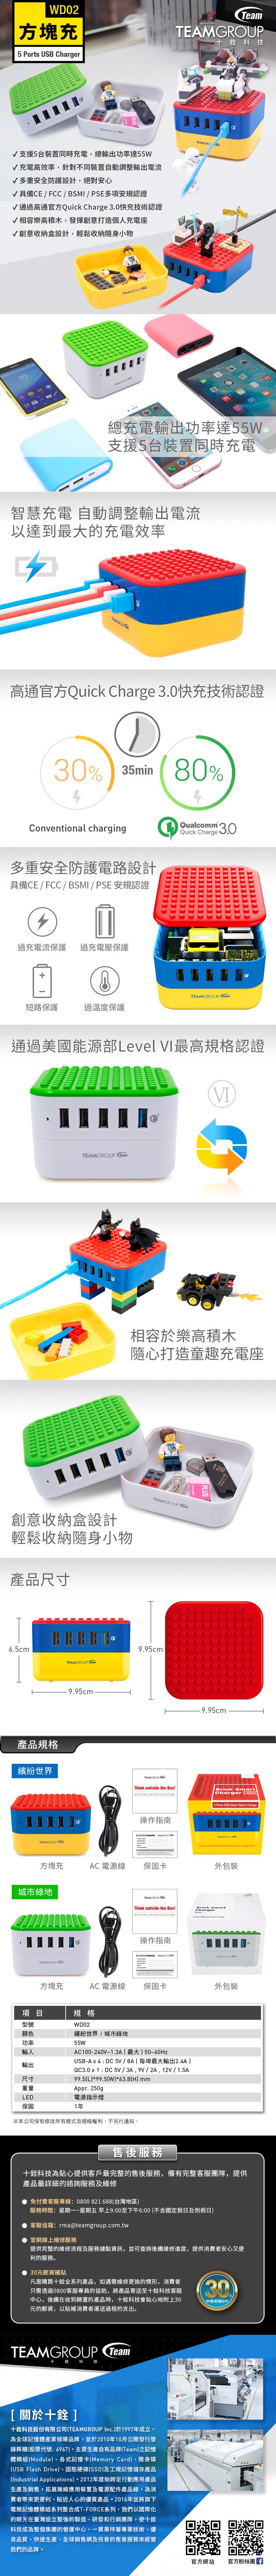 Team Group WD02 積木方塊充電座-相容樂高積木,支援QC 3.0快充